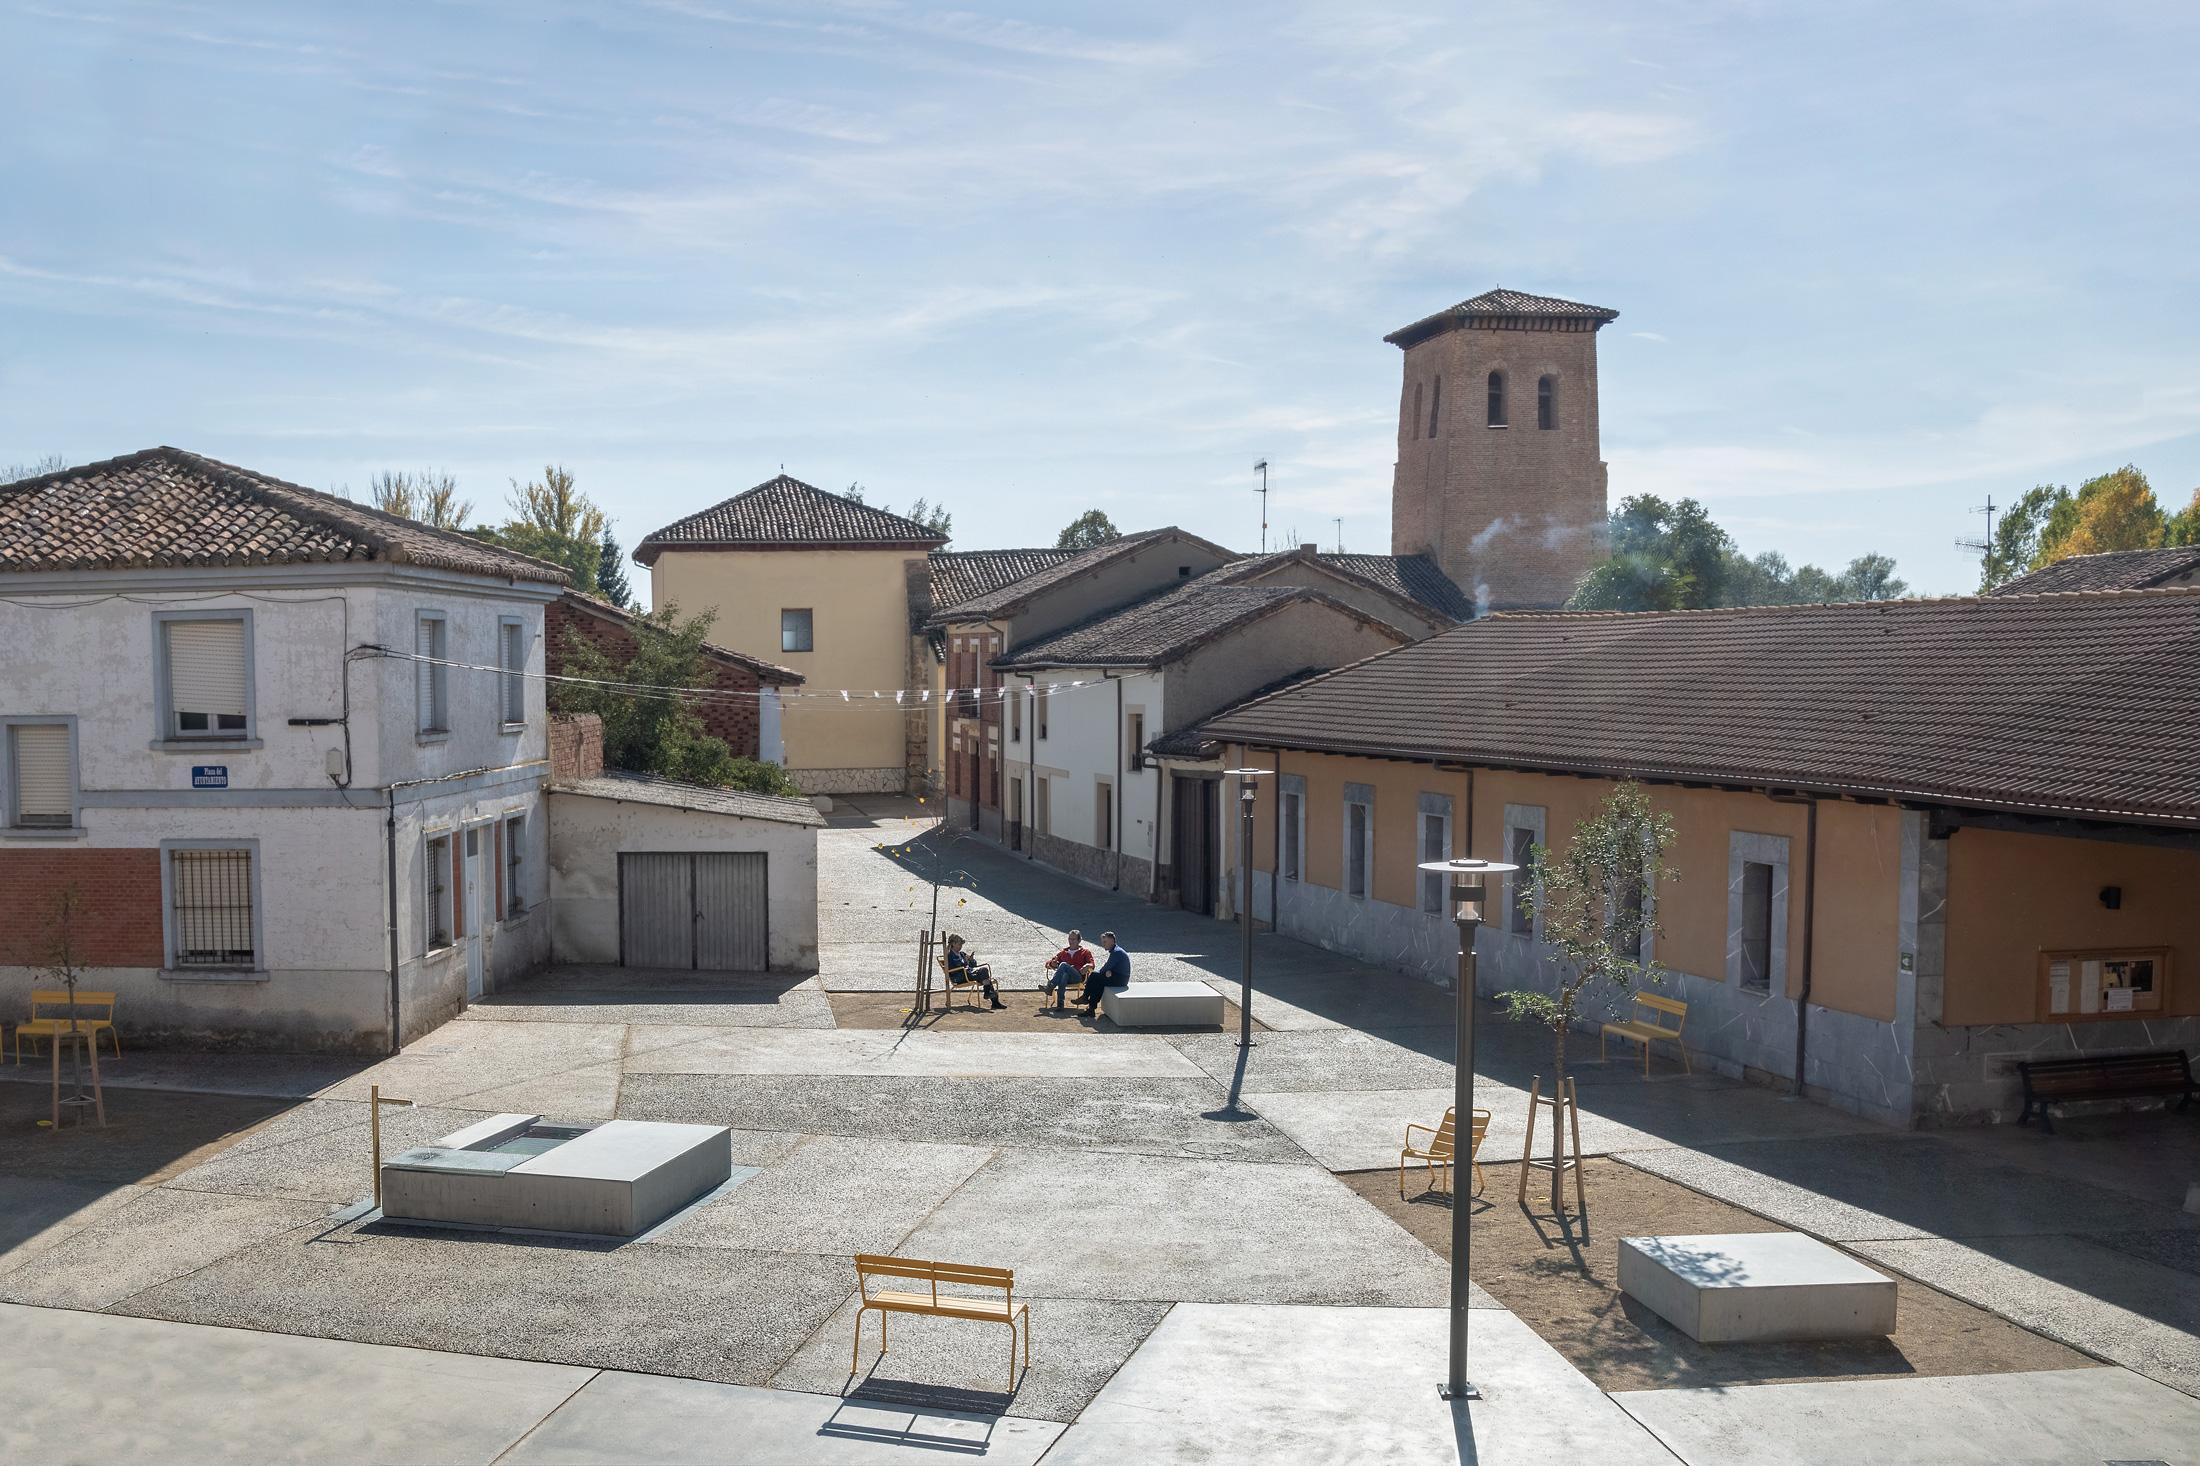 02-Plaza-mansilla-panoramica